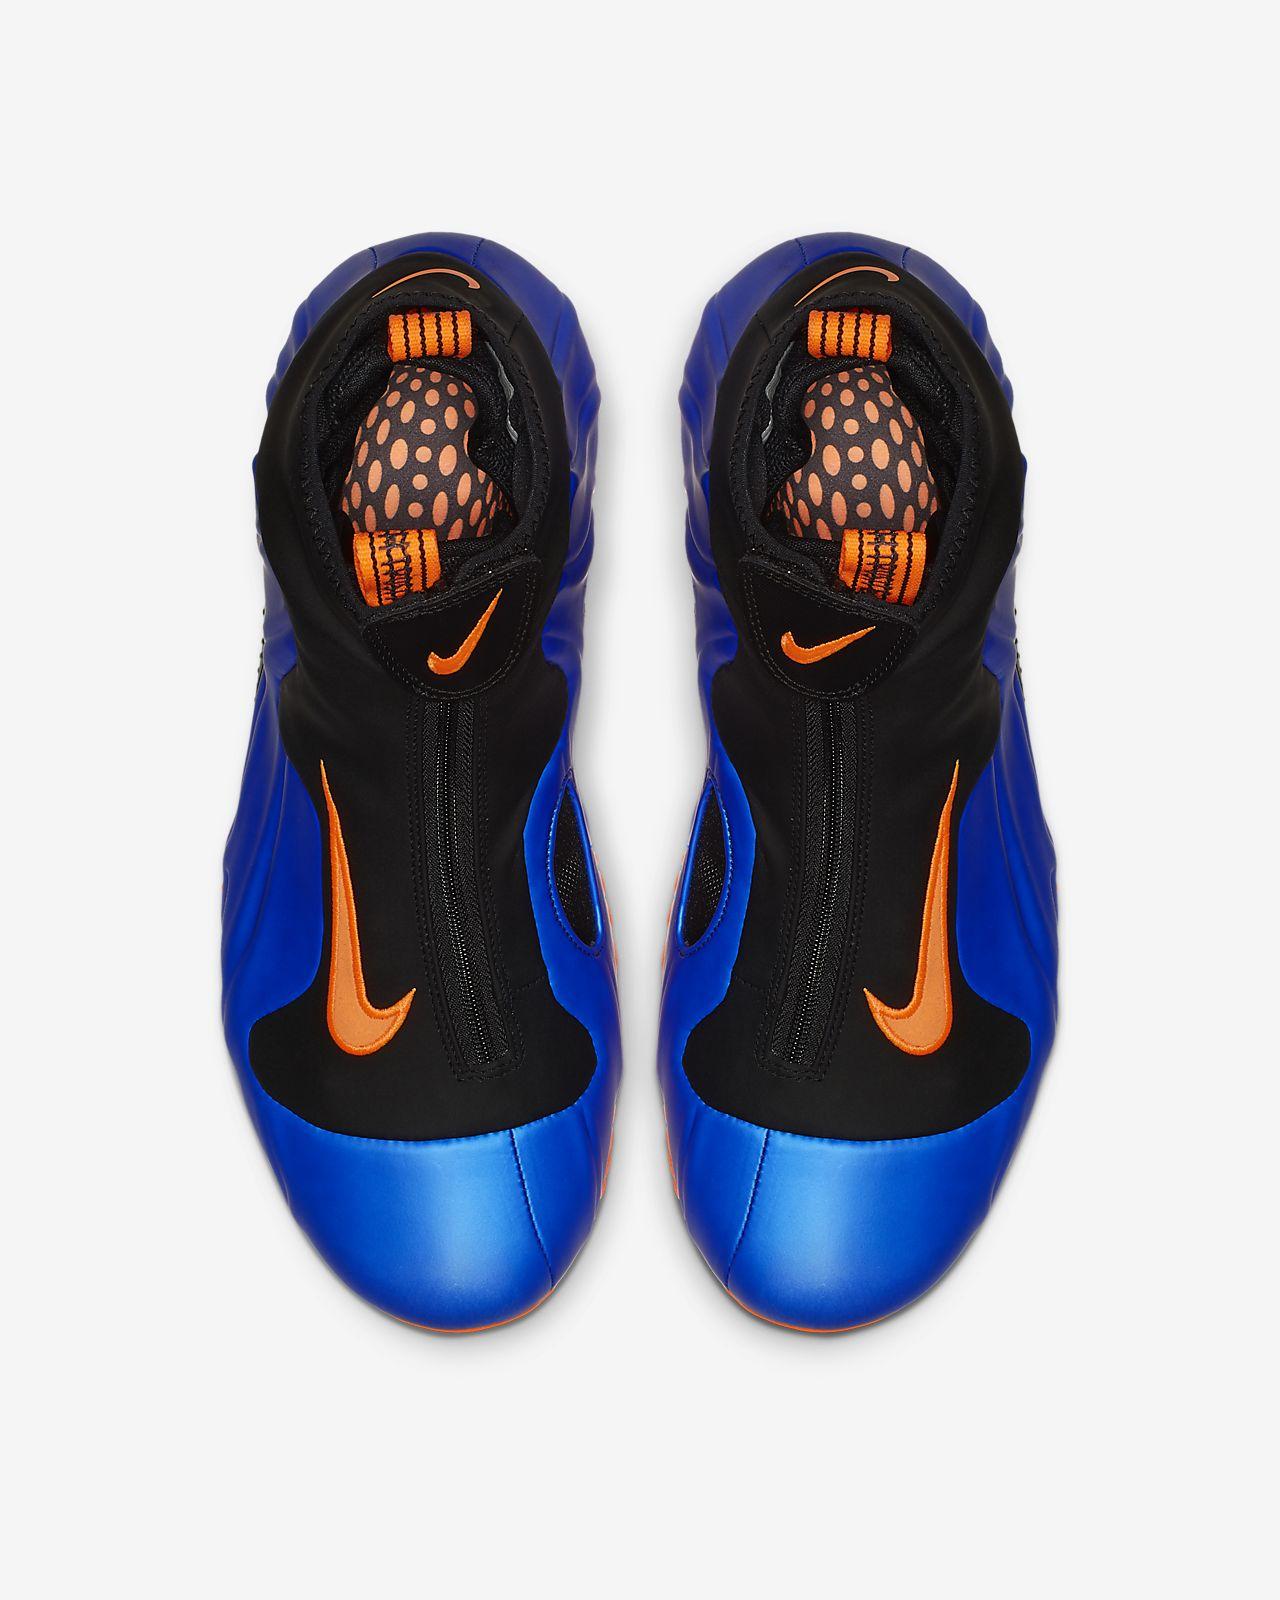 e1f6dcec467c Nike Air Flightposite Men s Shoe. Nike.com